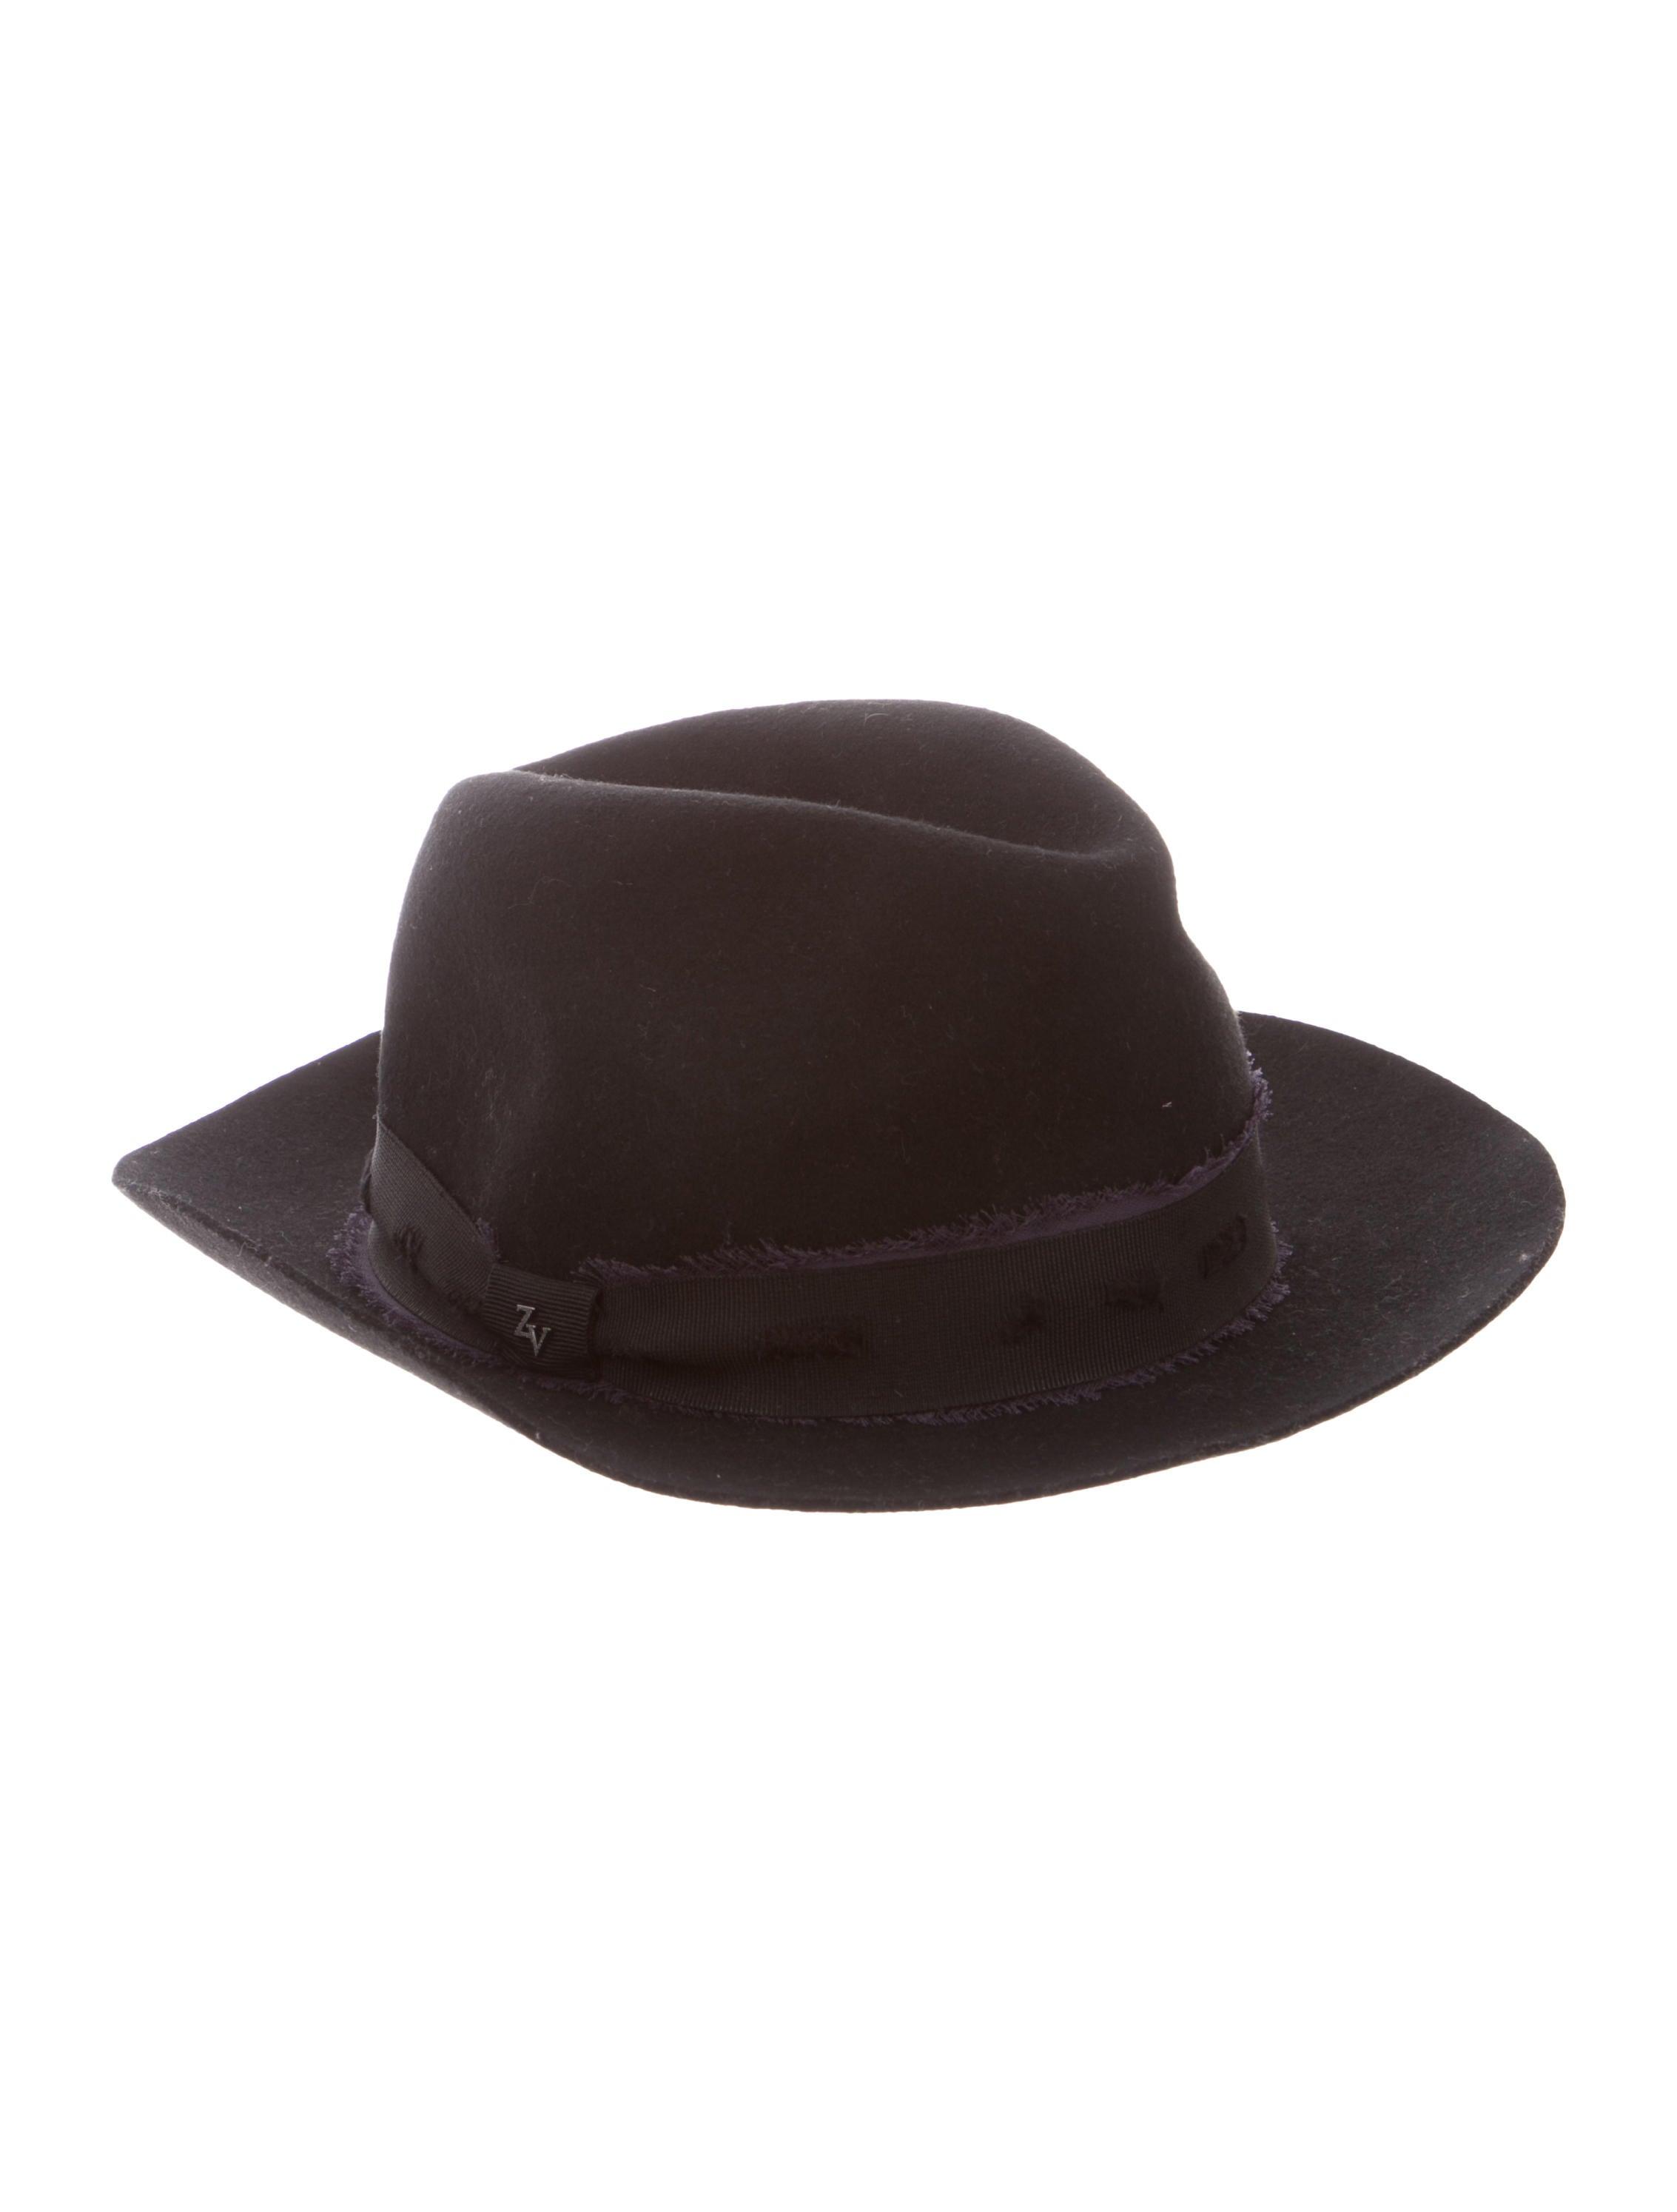 40422872fbe42 ... wholesale alabama ribbon hat 33155 29a0a